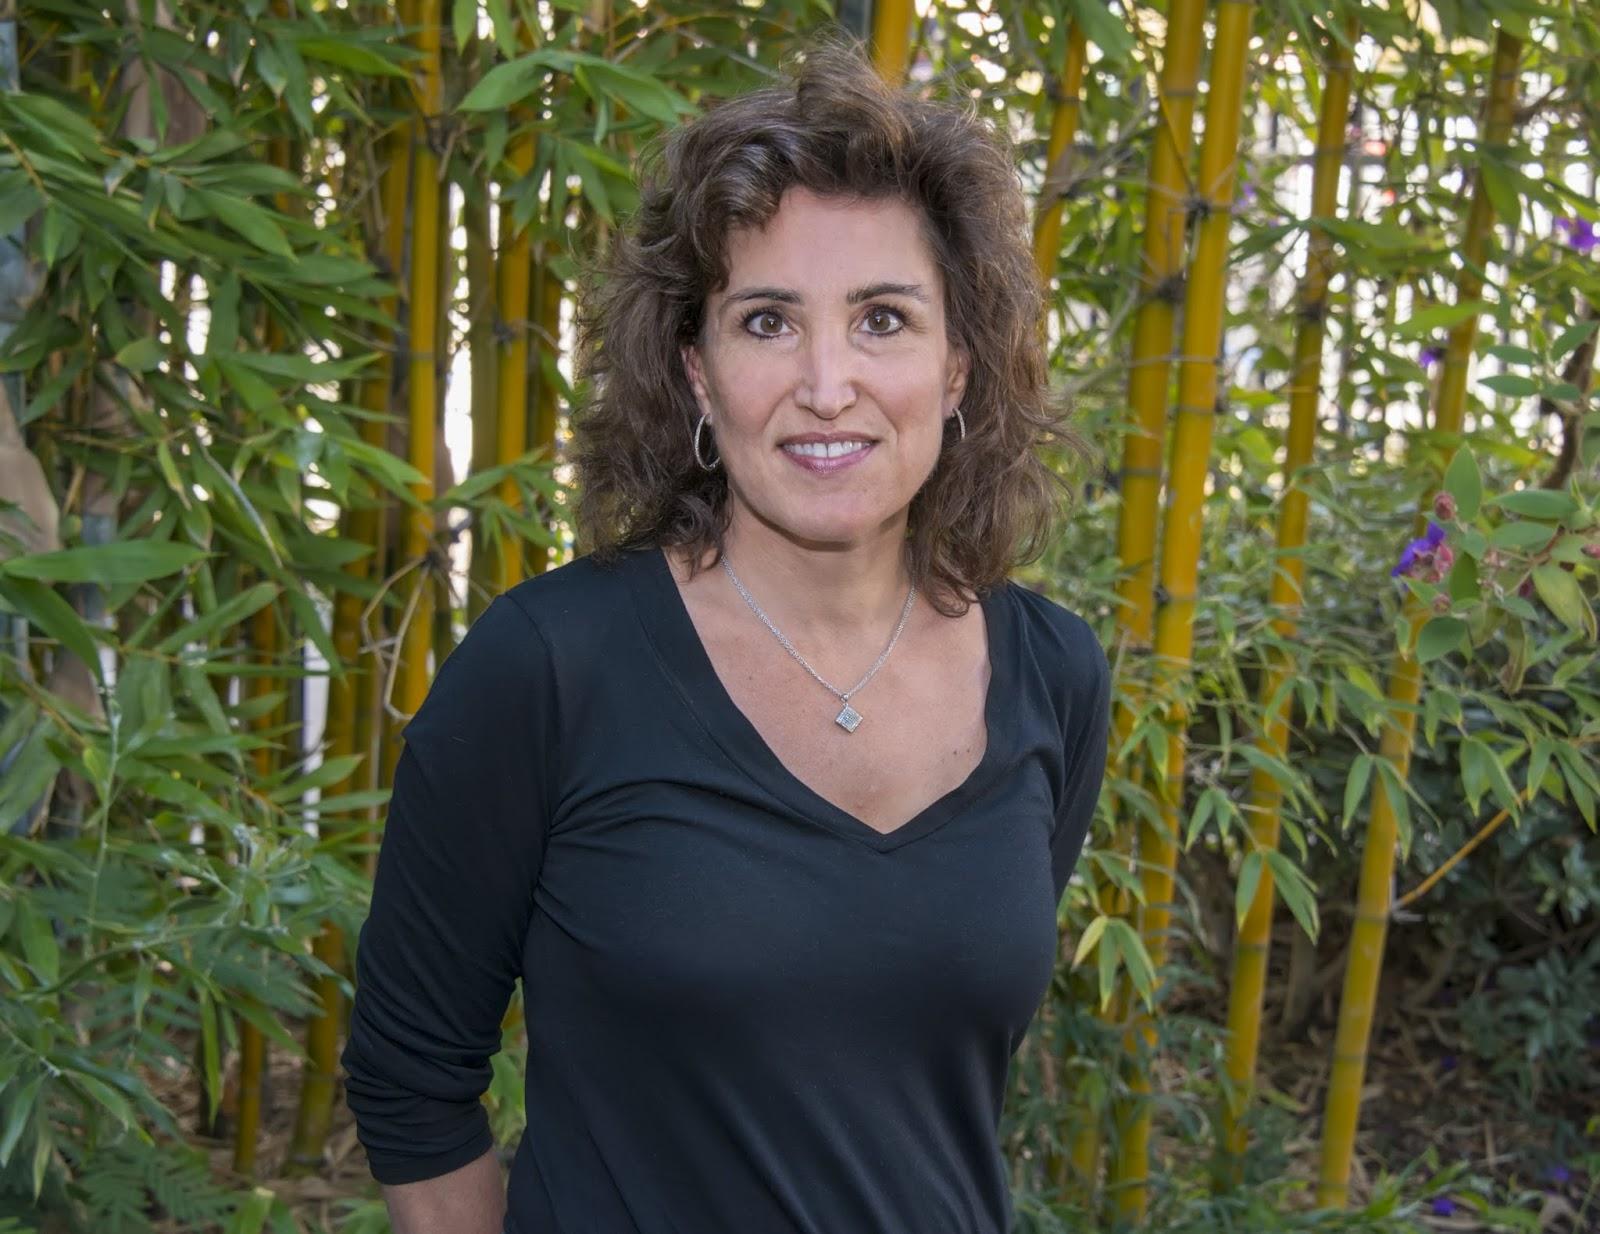 Helen Cademartori - BioSciences Area Operations Deputy - BSAO.